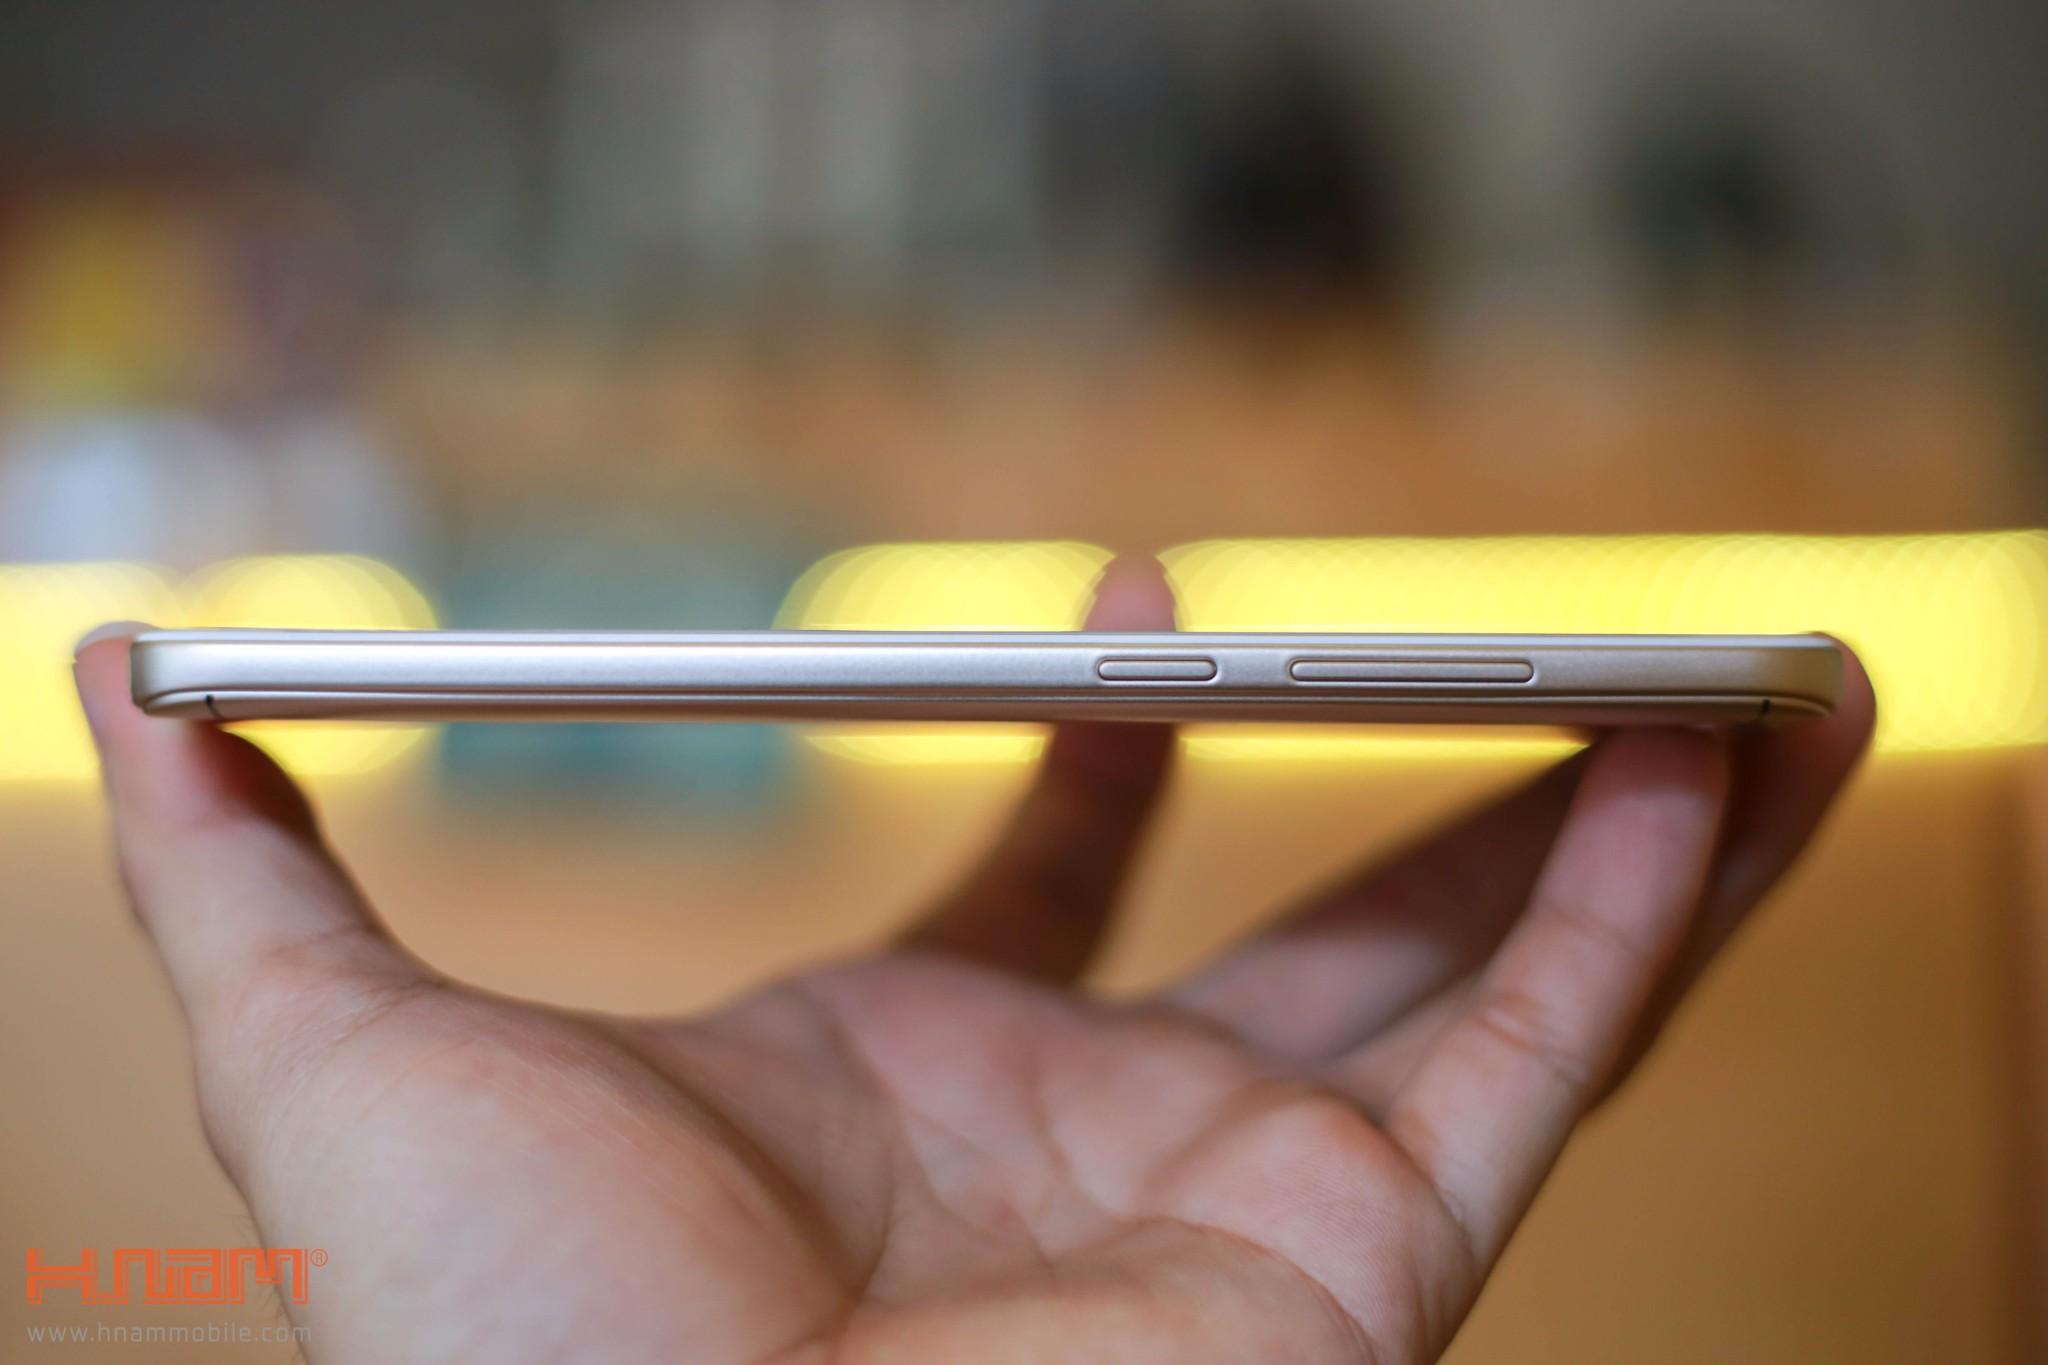 giá HTC Desire 601 Dual Sim